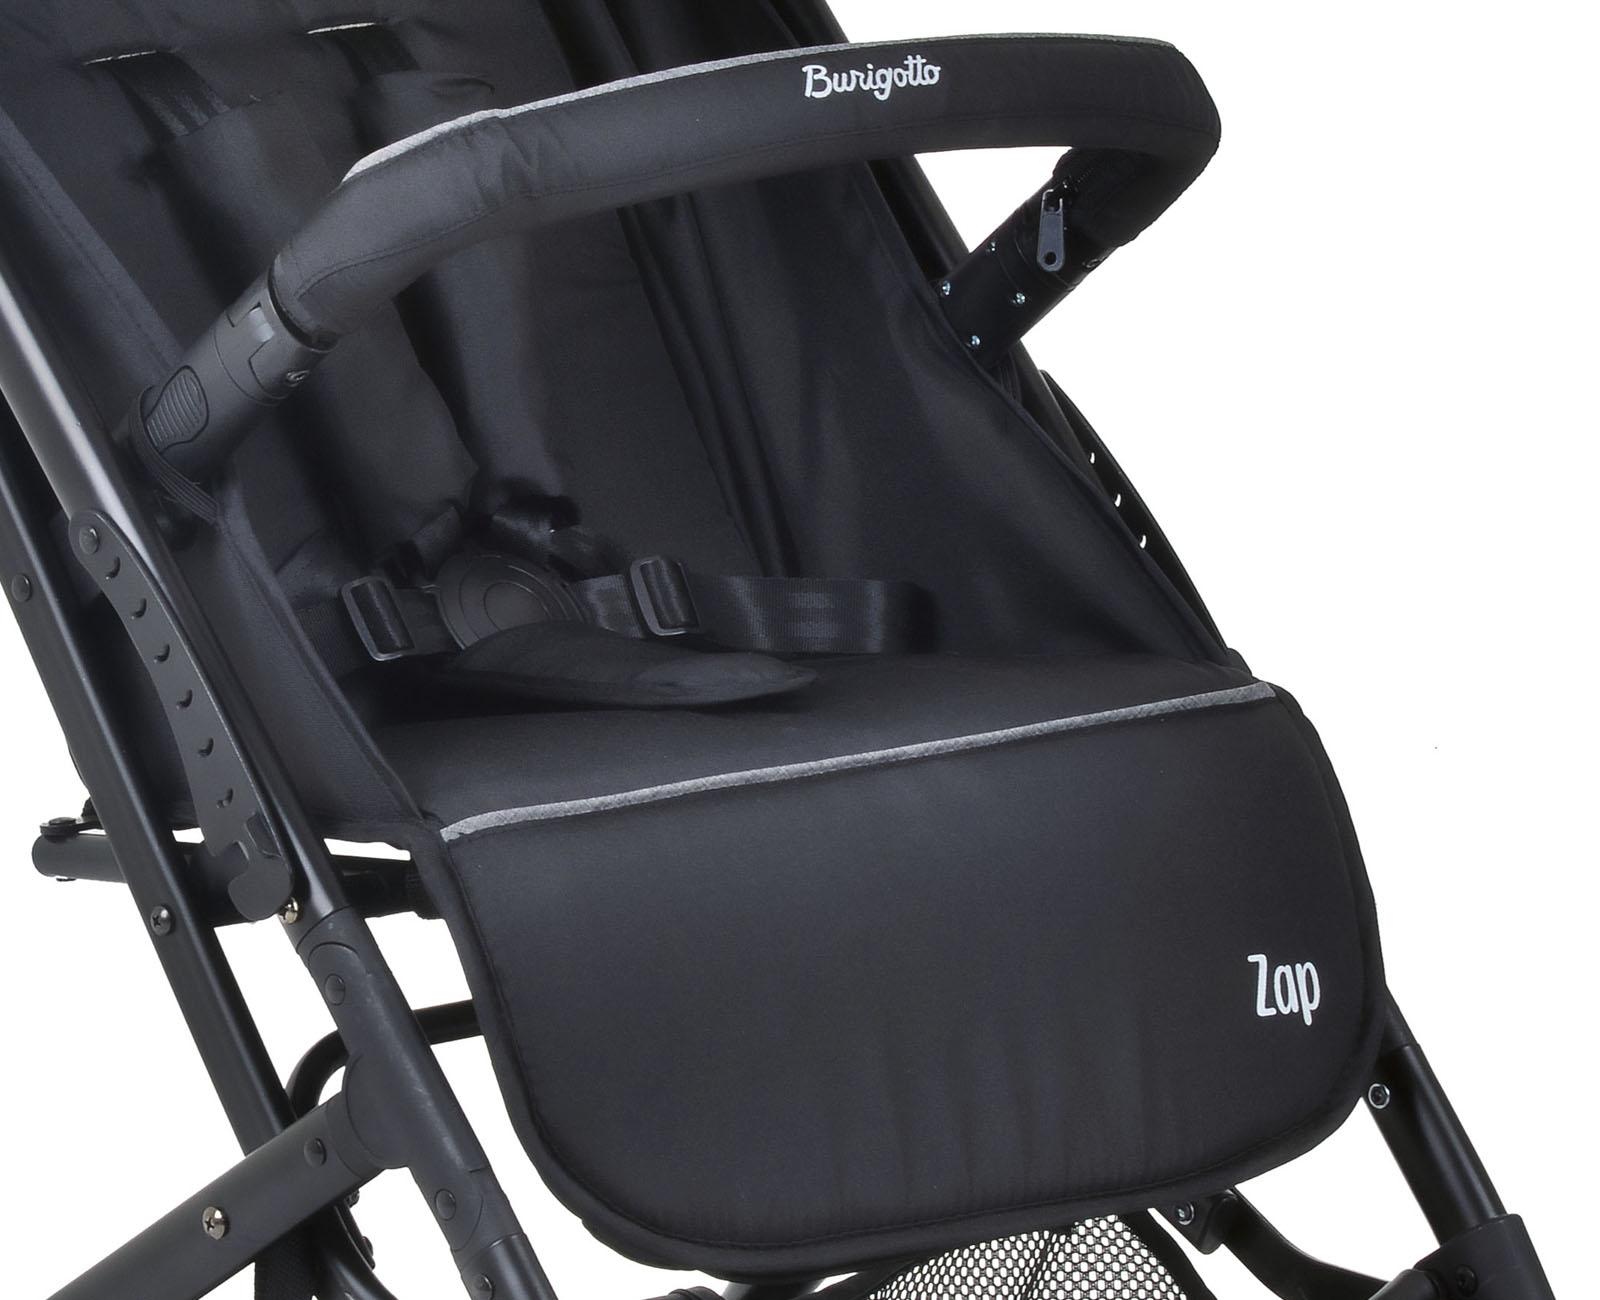 Kit Carrinho de Bebê Zap Preto + Bebe Conforto Burigotto